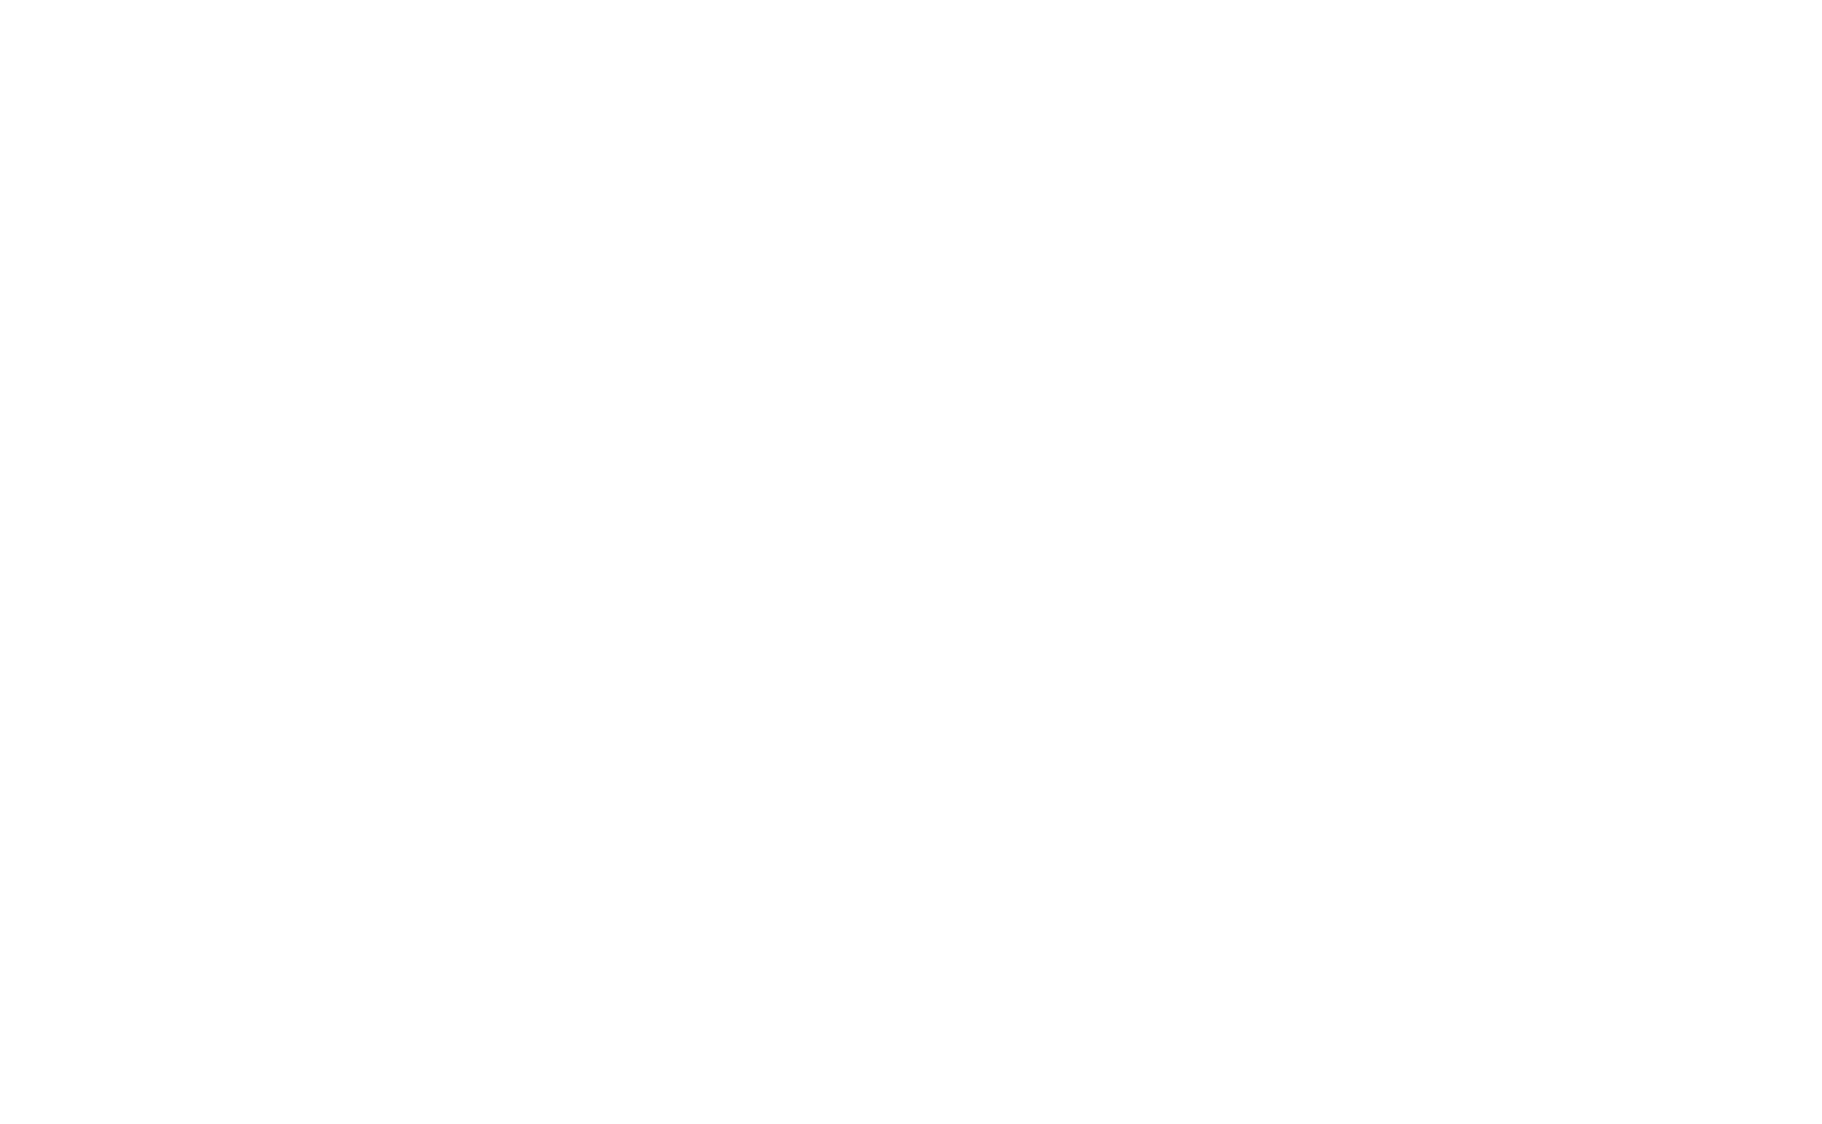 XSLMFCE